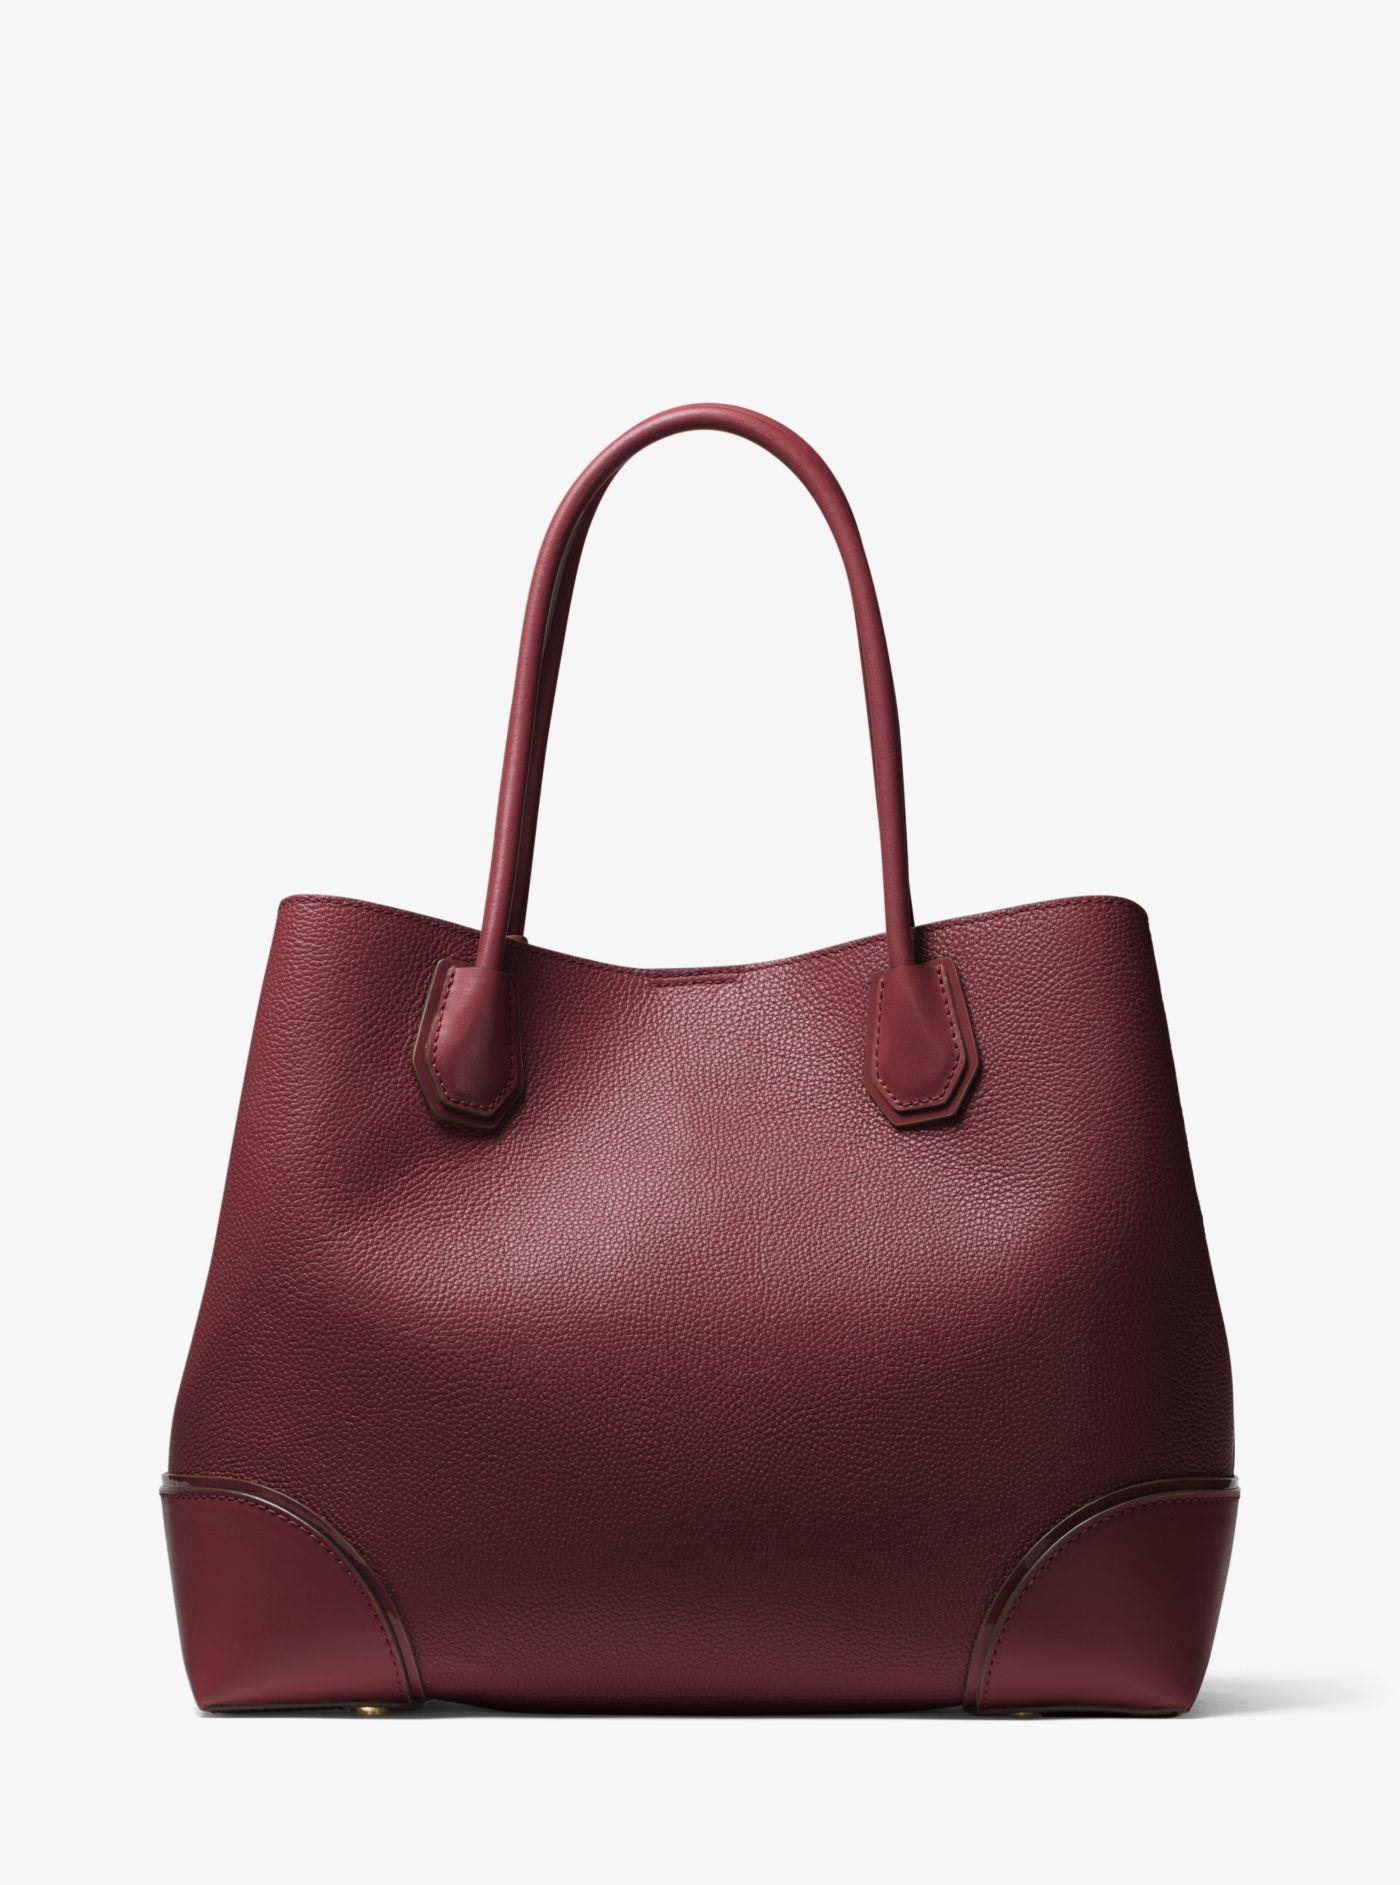 michael kors mercer gallery large leather satchel lyst rh lyst co uk